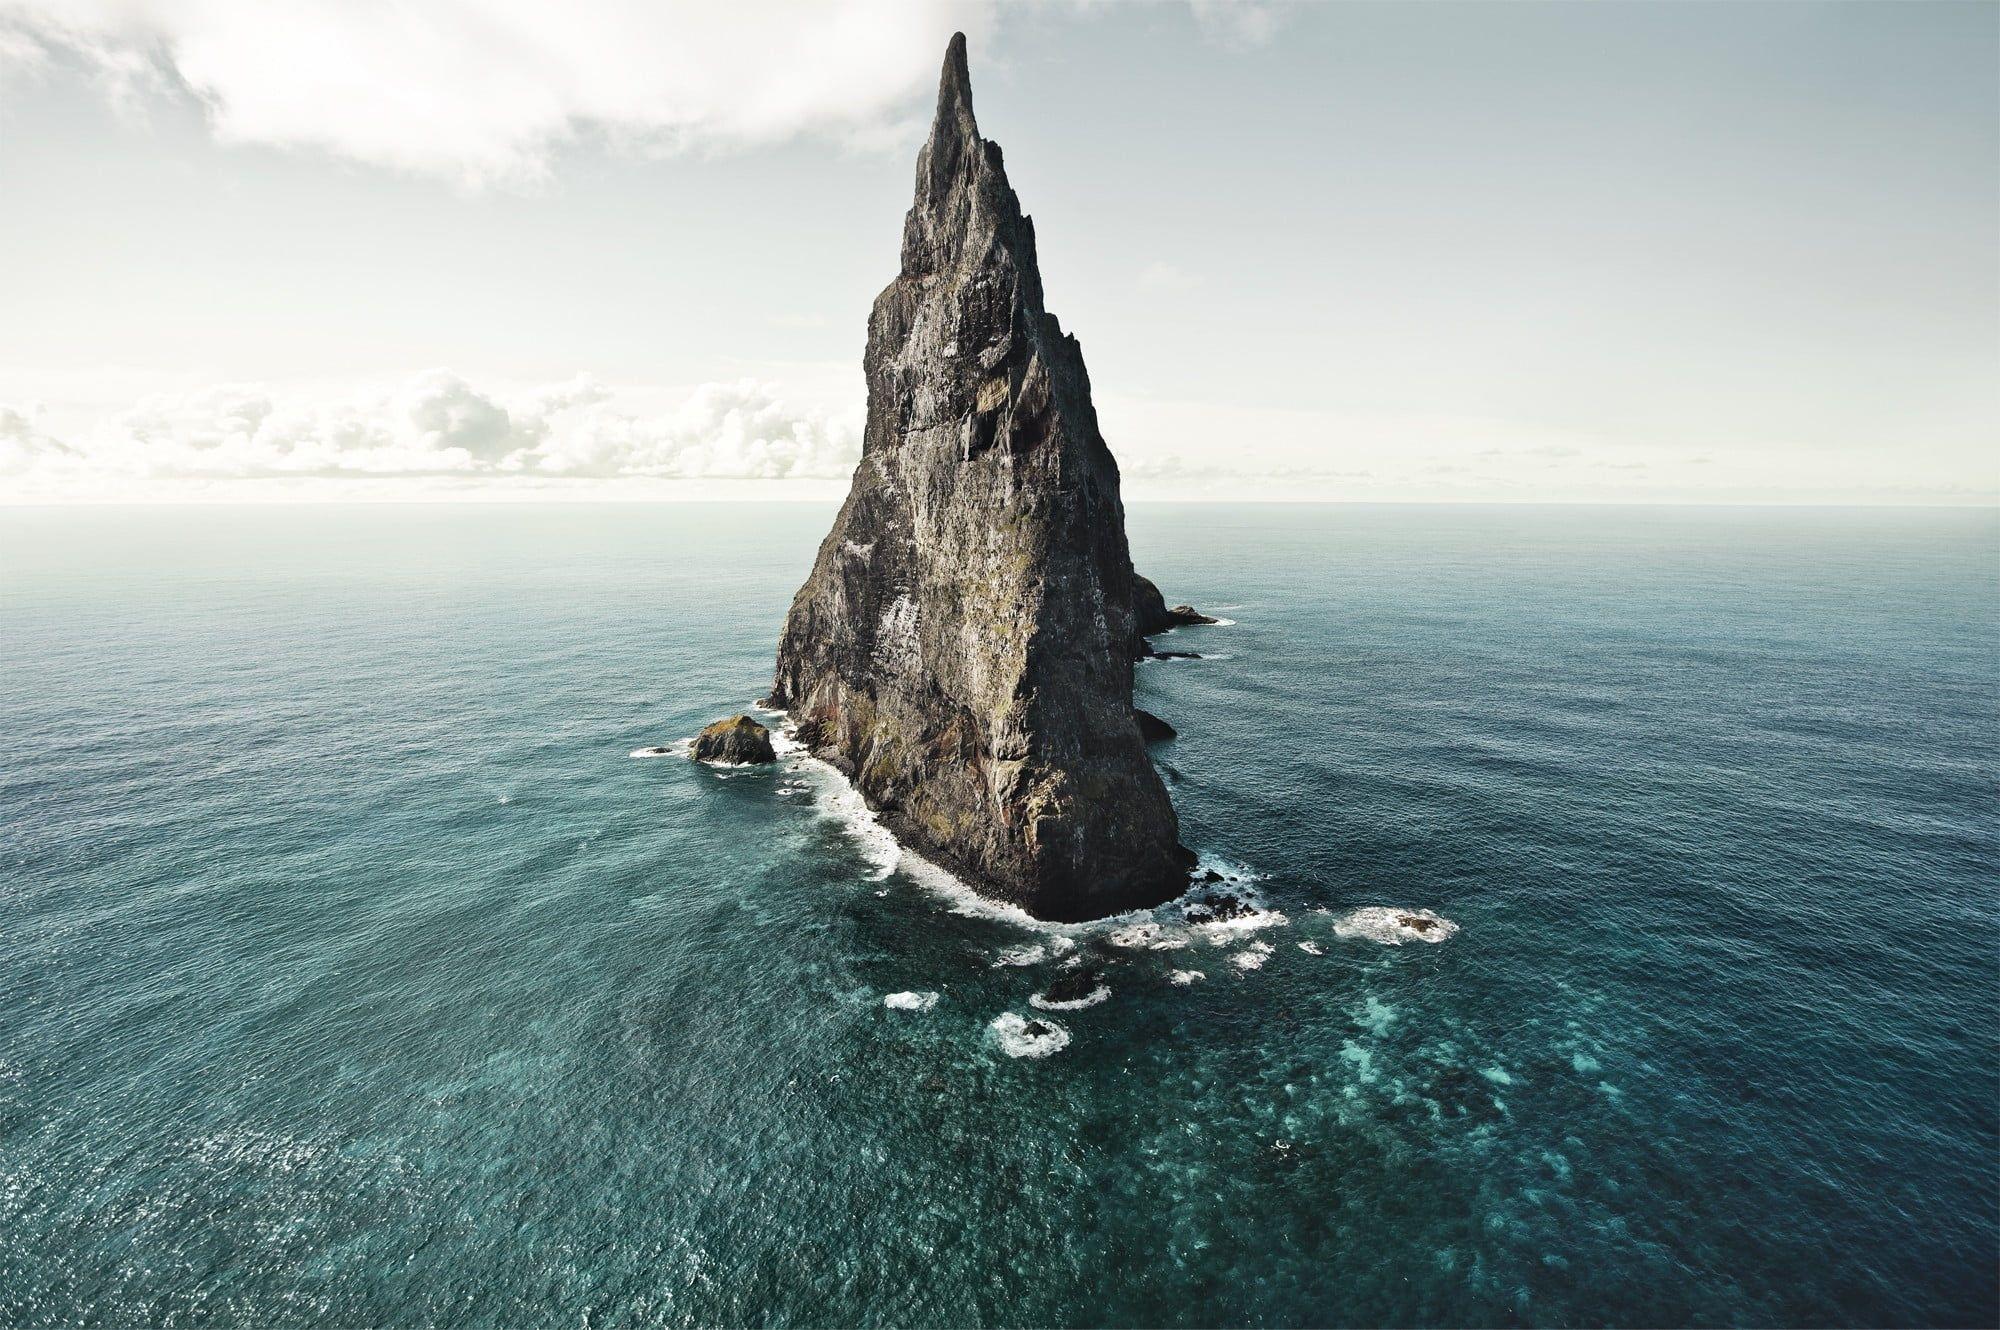 Stone Spire On Water Digital Wallpaper Gray Rock Formation On